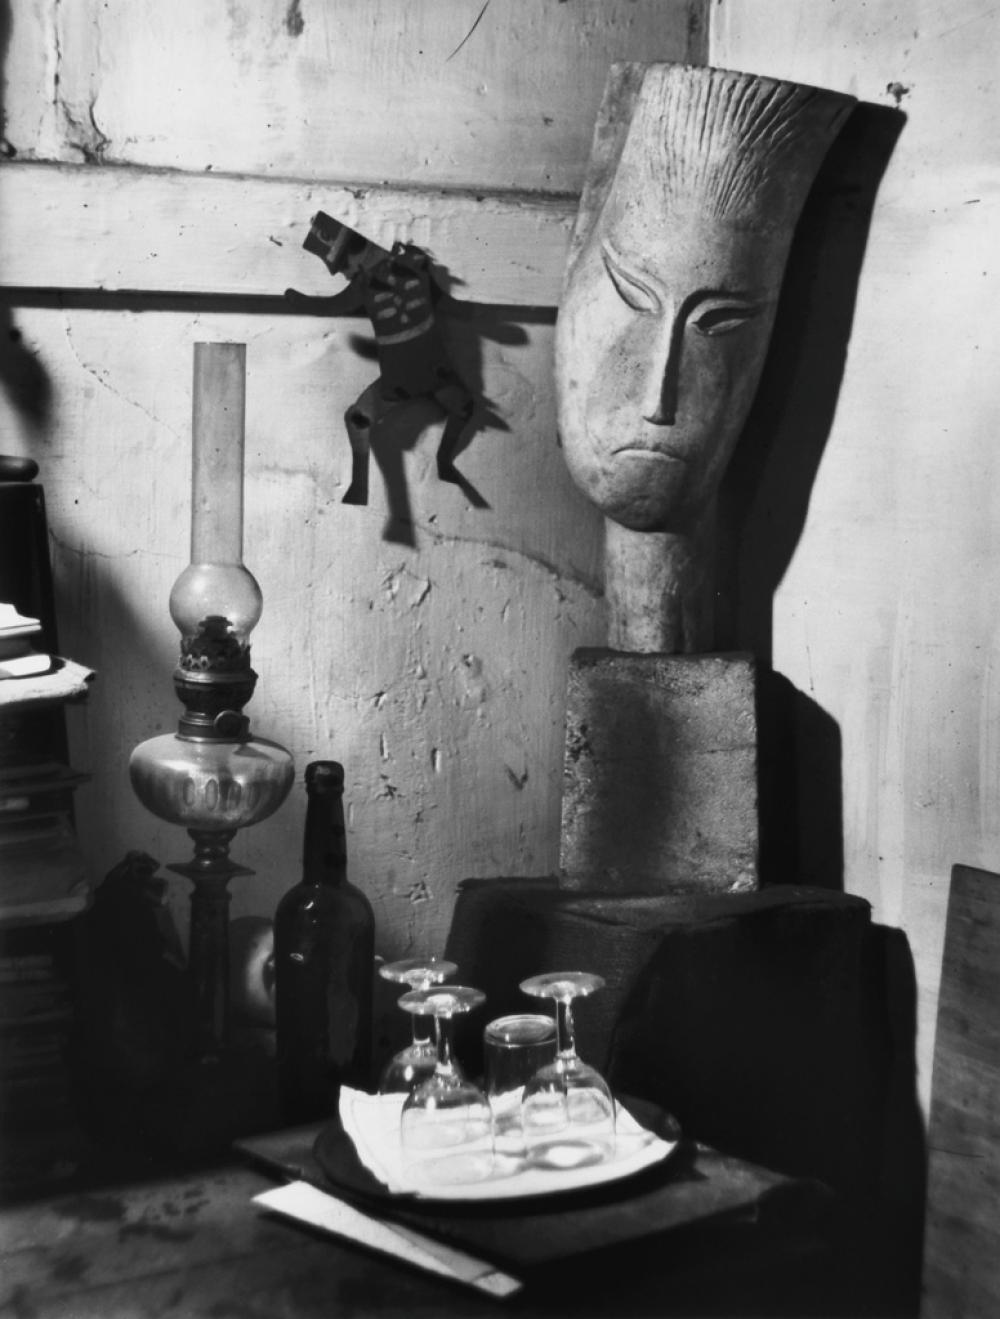 ANDRÉ KERTÉSZ (1894-1985) Ossip Zadkine's sculpture studio.